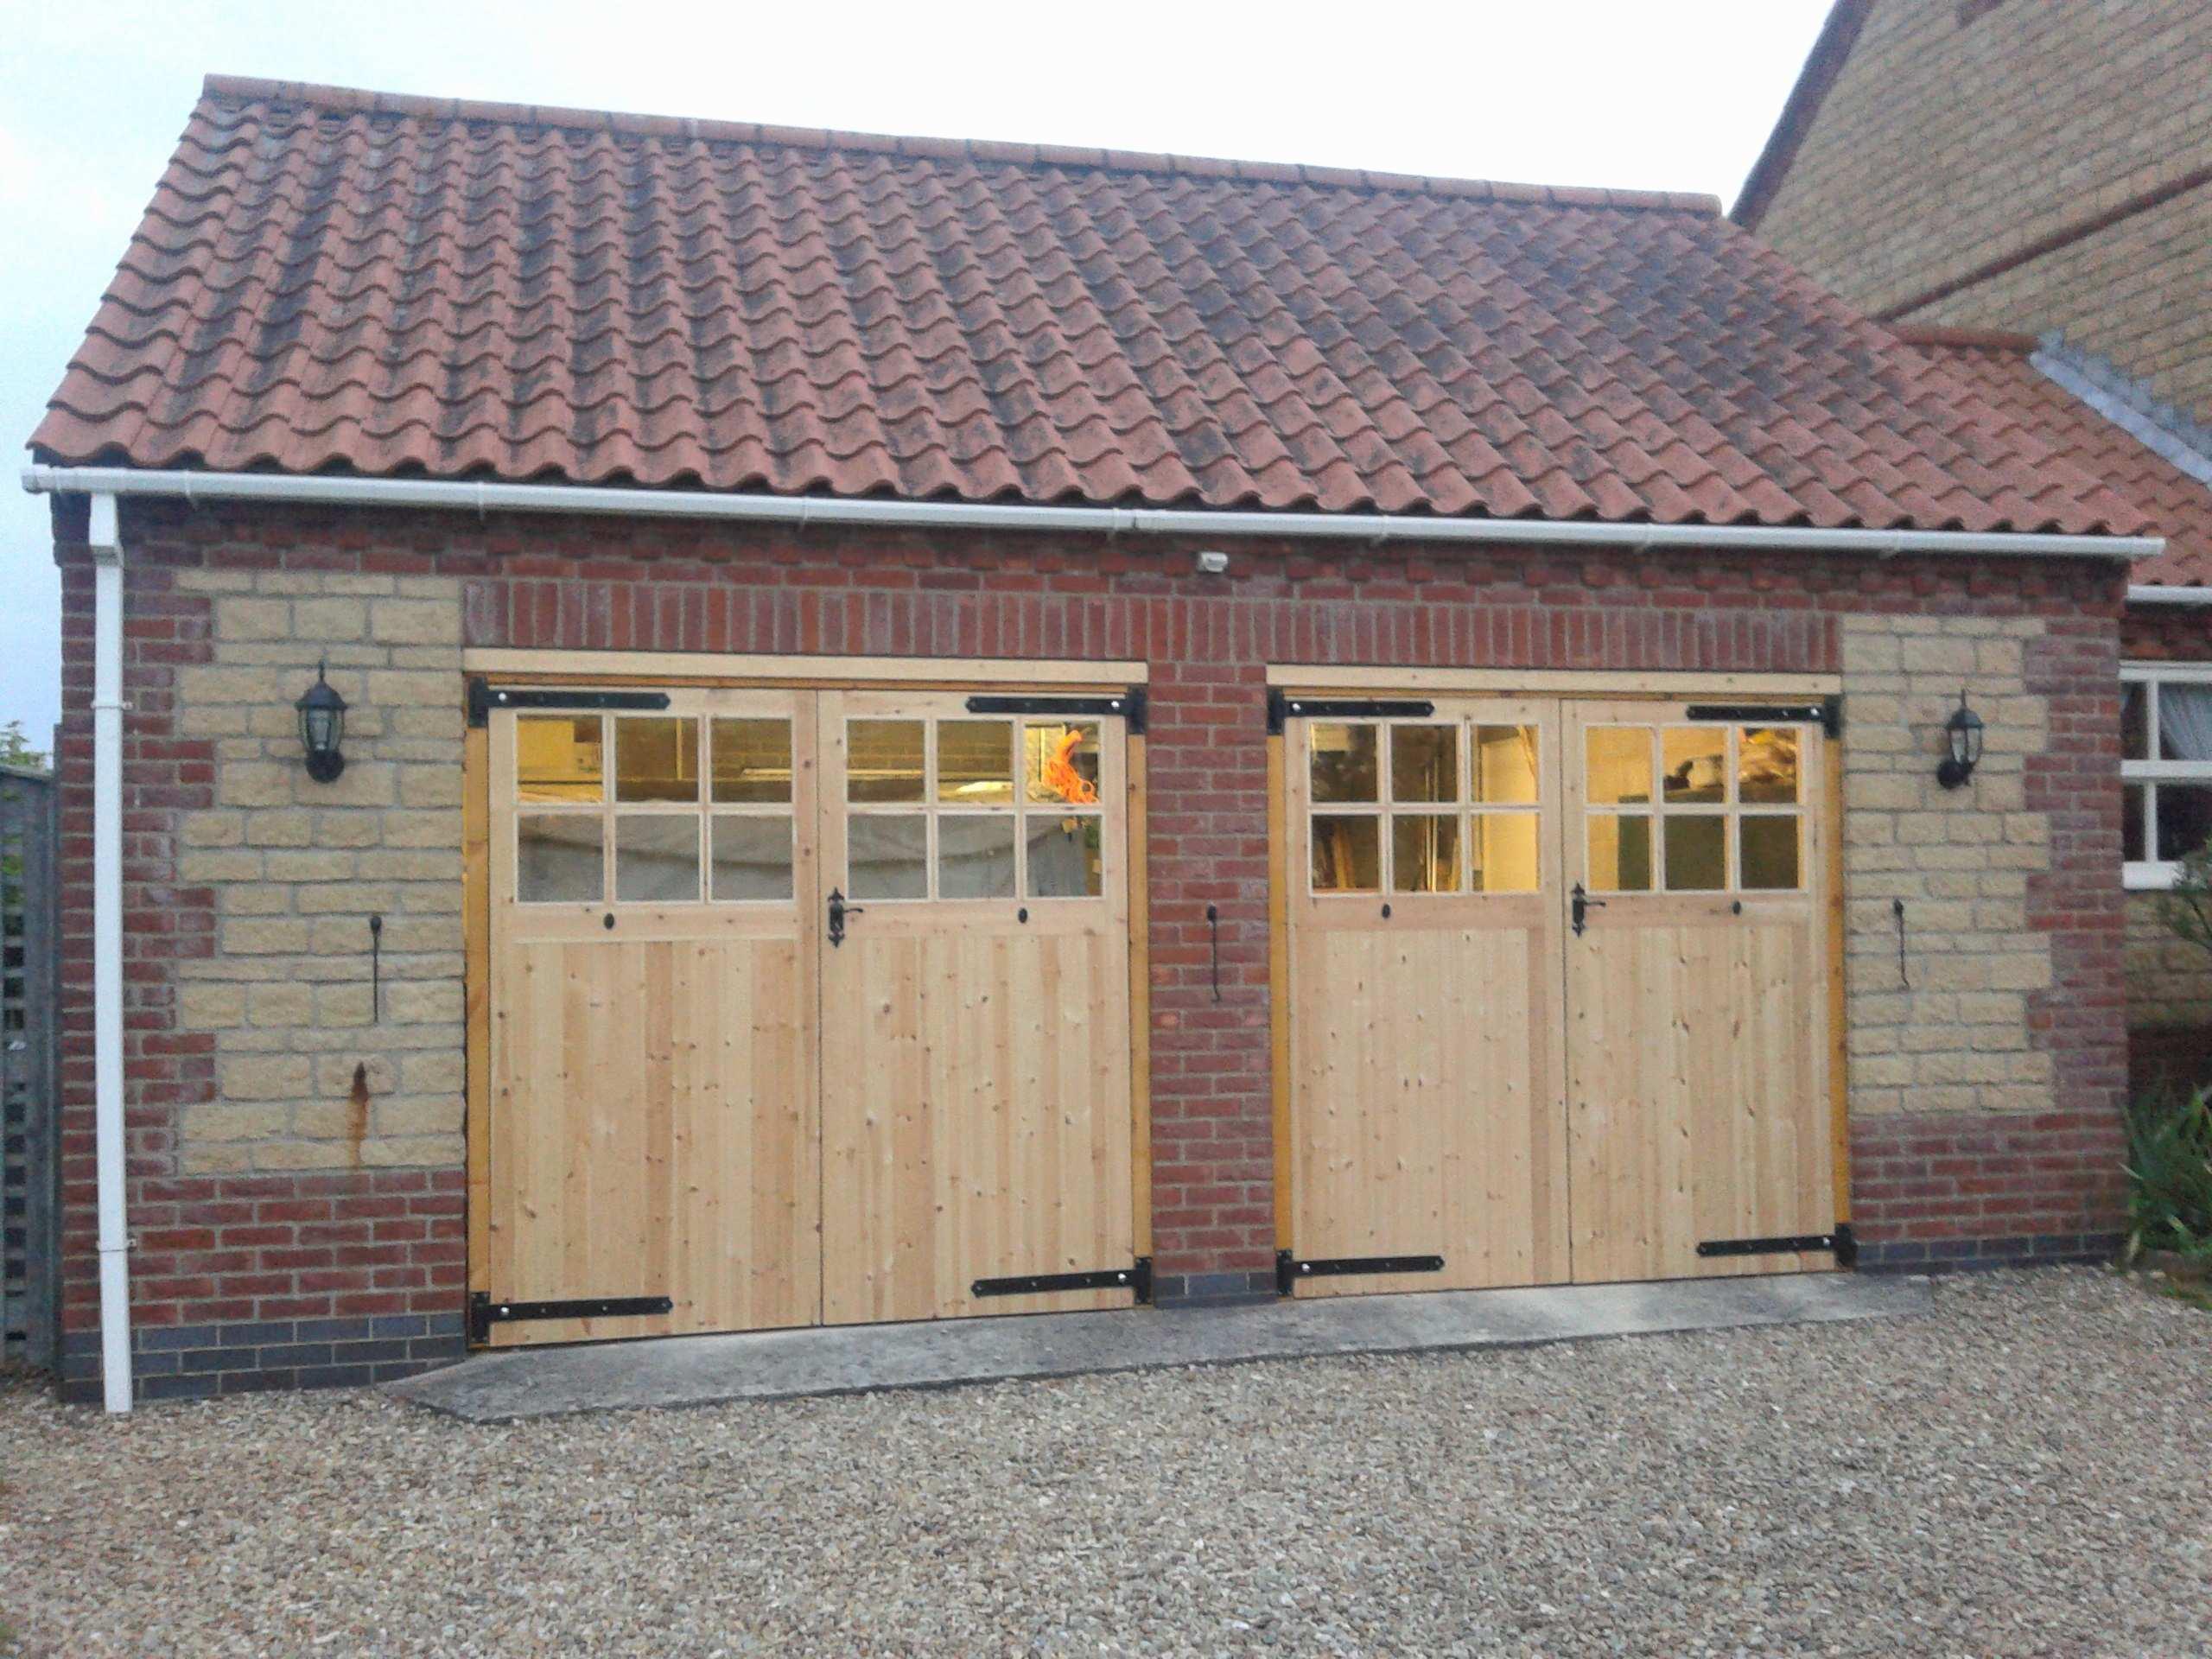 40 Expert Double Wide Garage Door Za358 Oneplus pertaining to dimensions 2560 X 1920